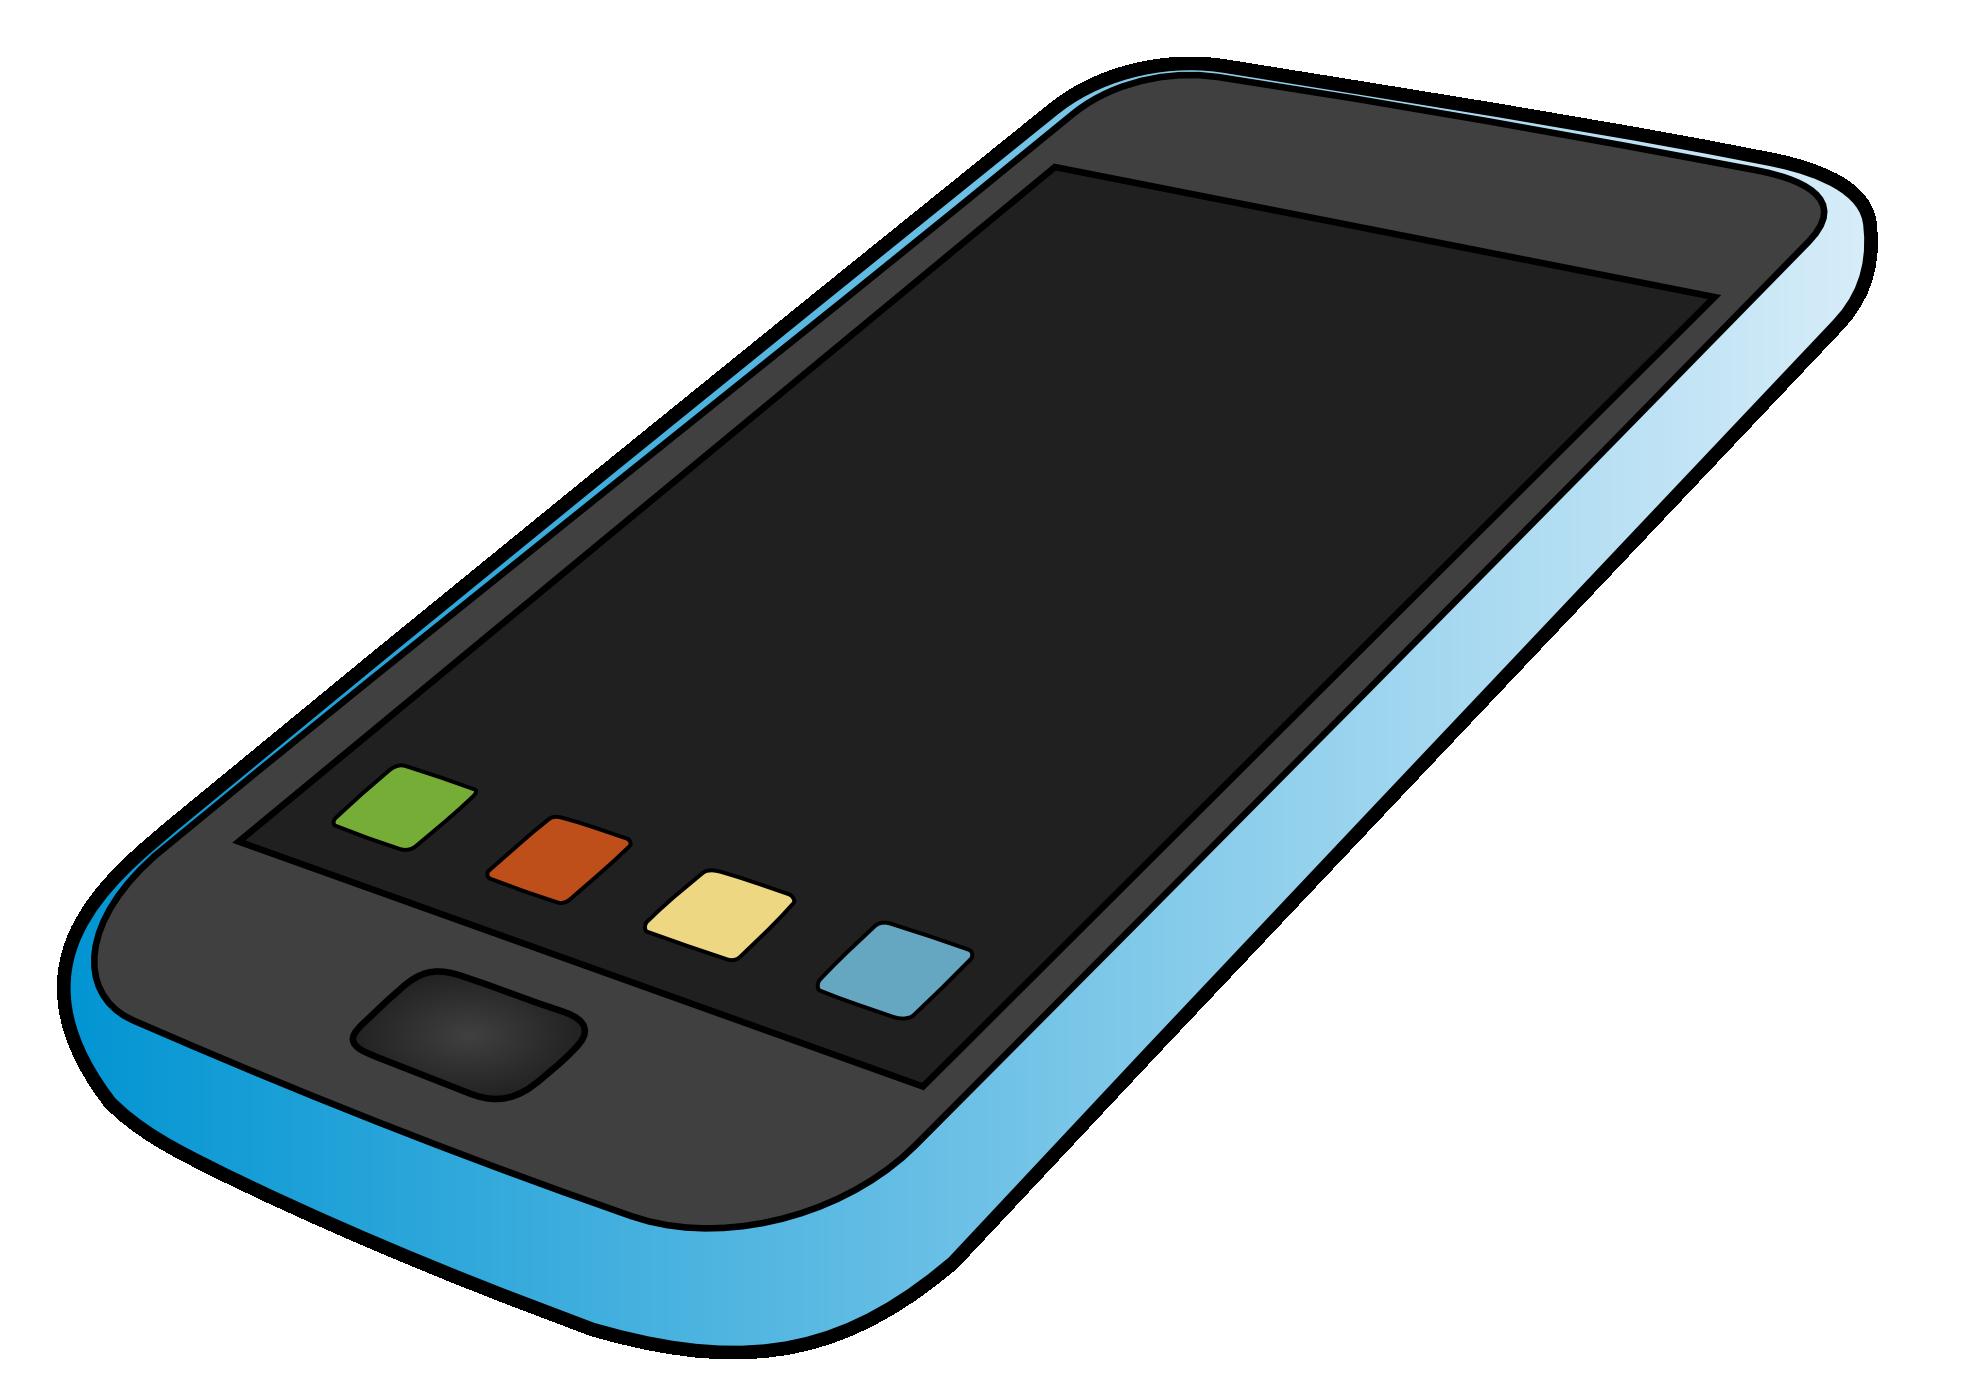 Iphone Cell Phone Clipart-iphone cell phone clipart-9